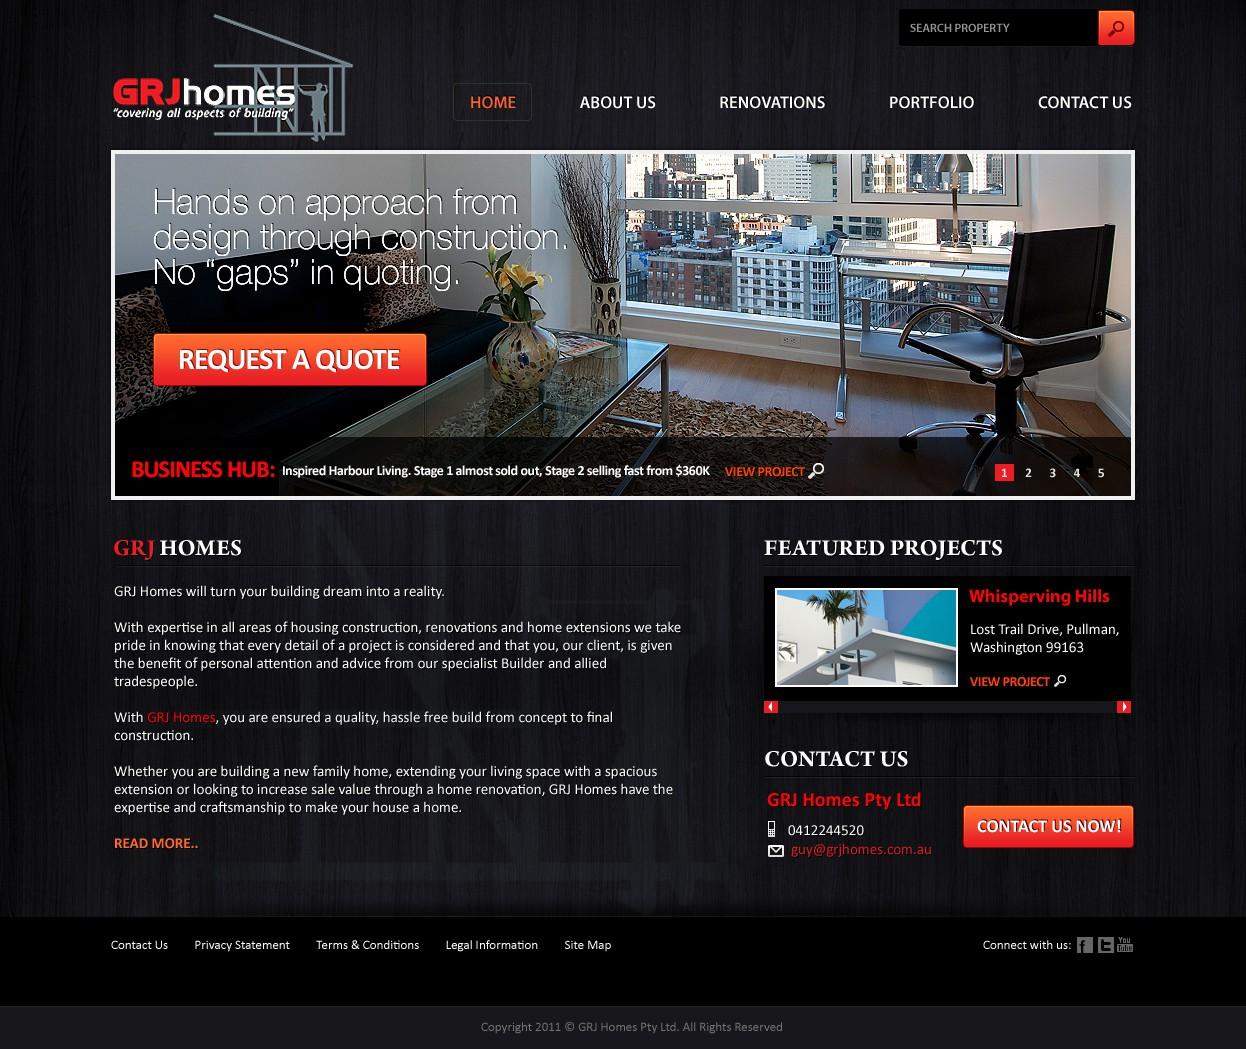 Create the next website design for GRJ Homes